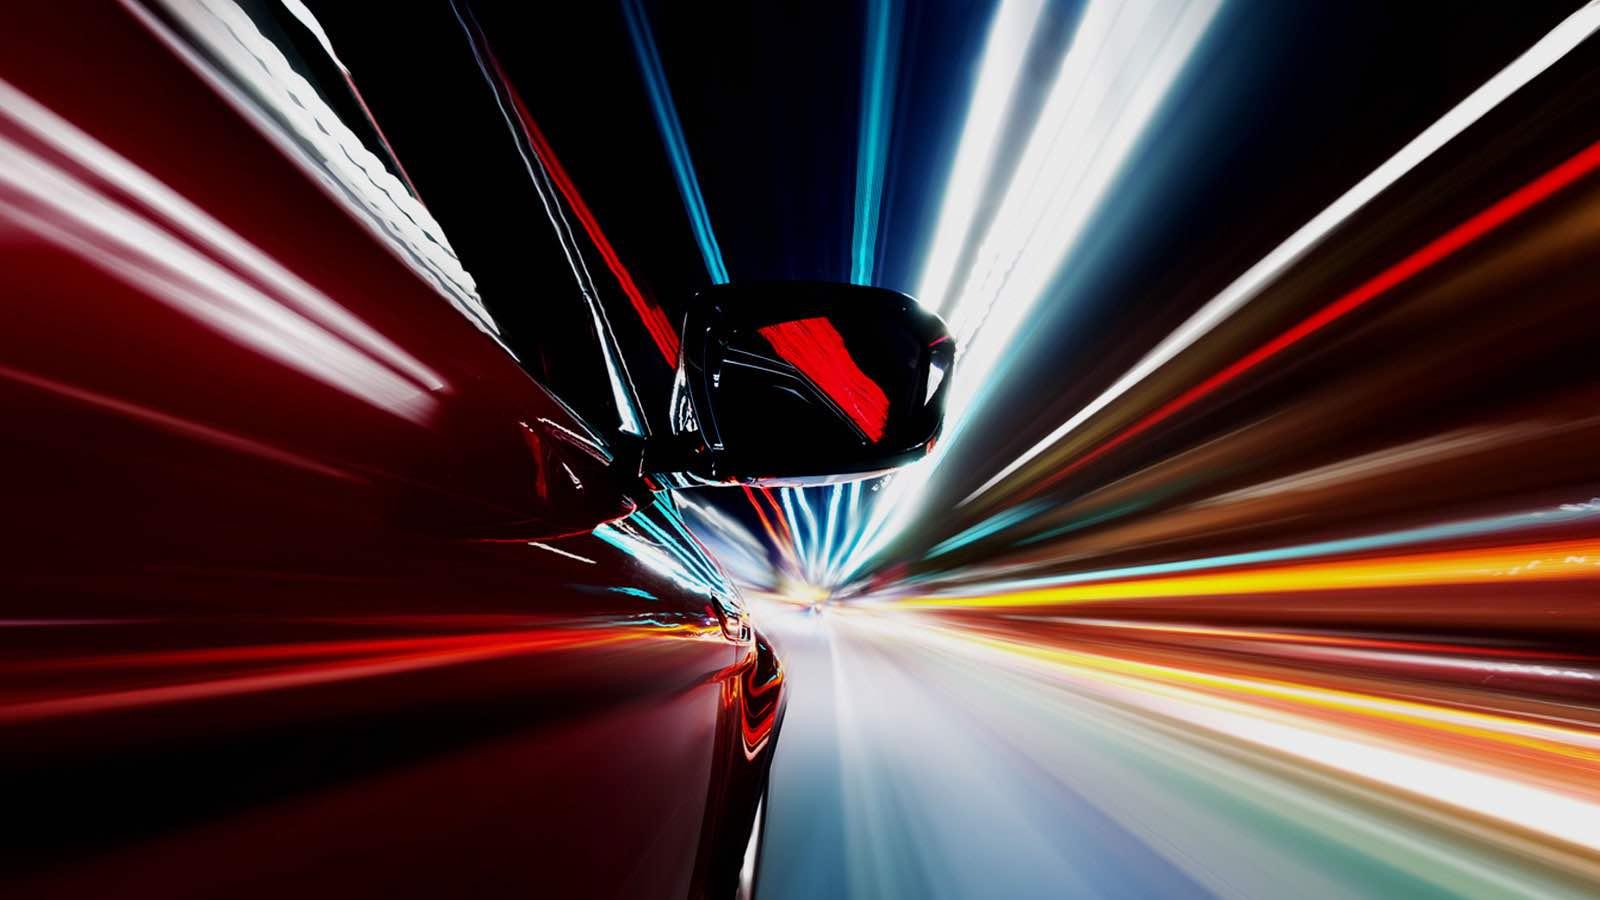 Accenture-Visita-Automotive-marquee_2019